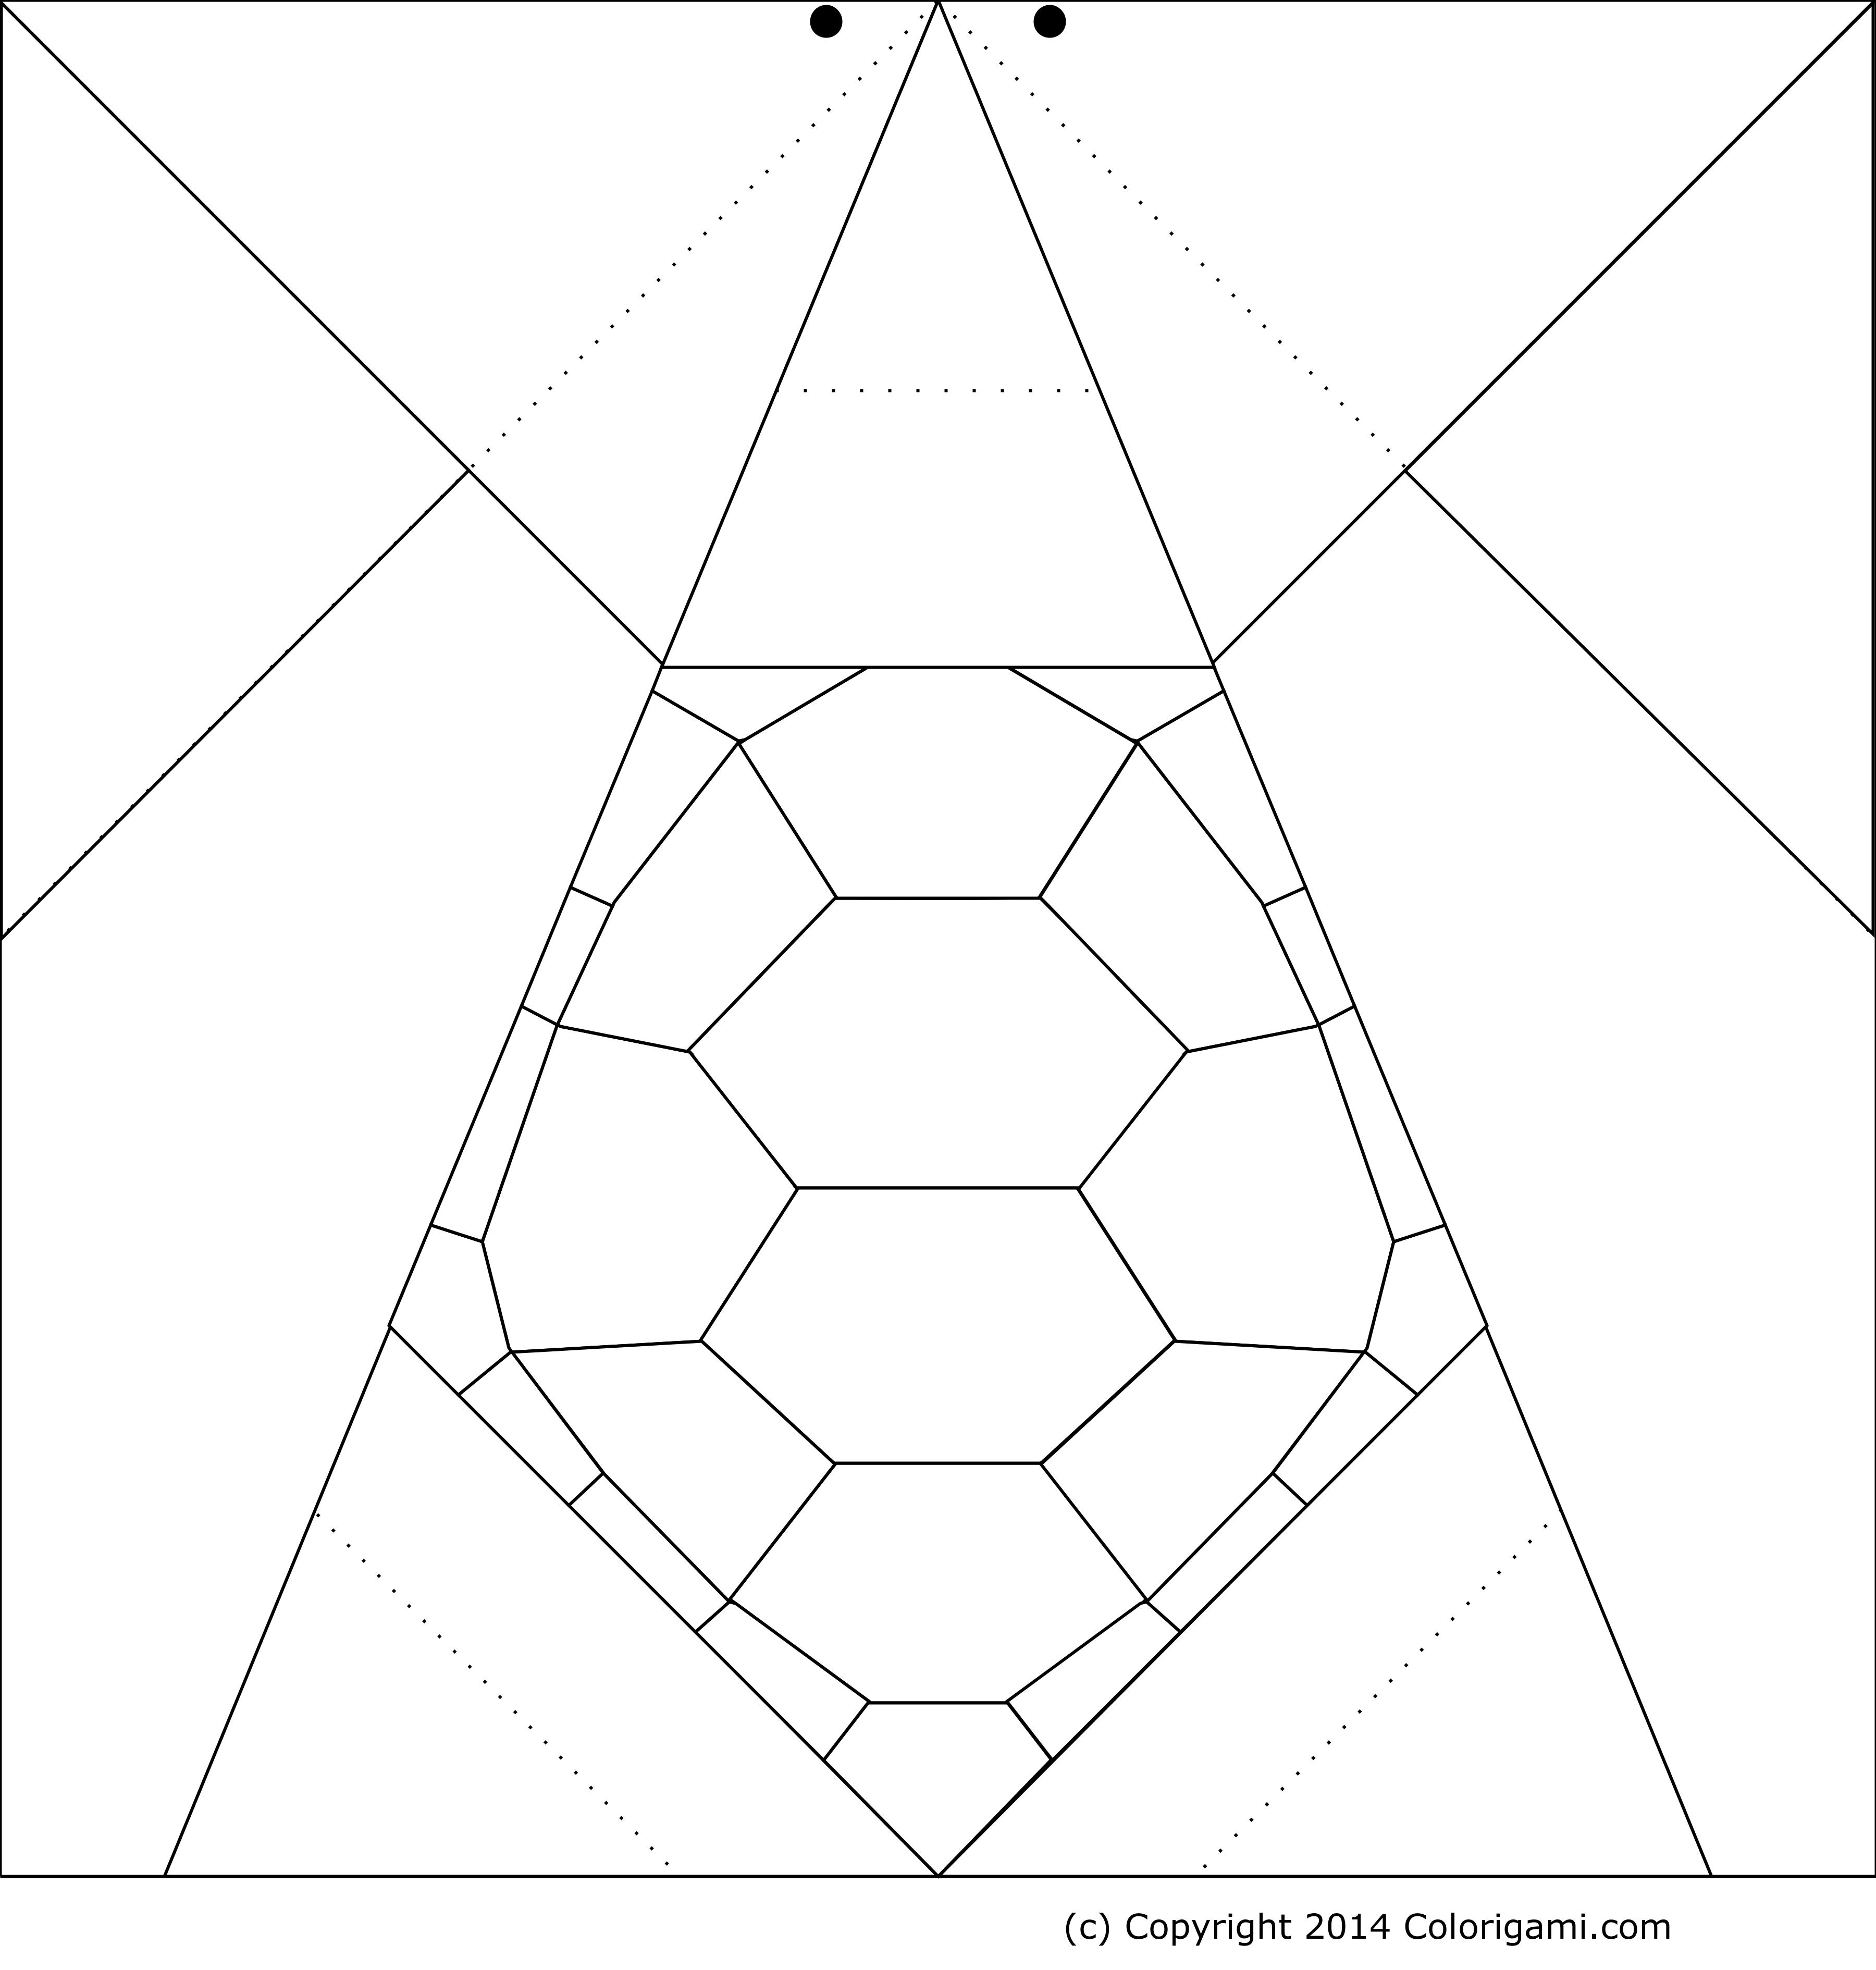 Origami coloring #2, Download drawings